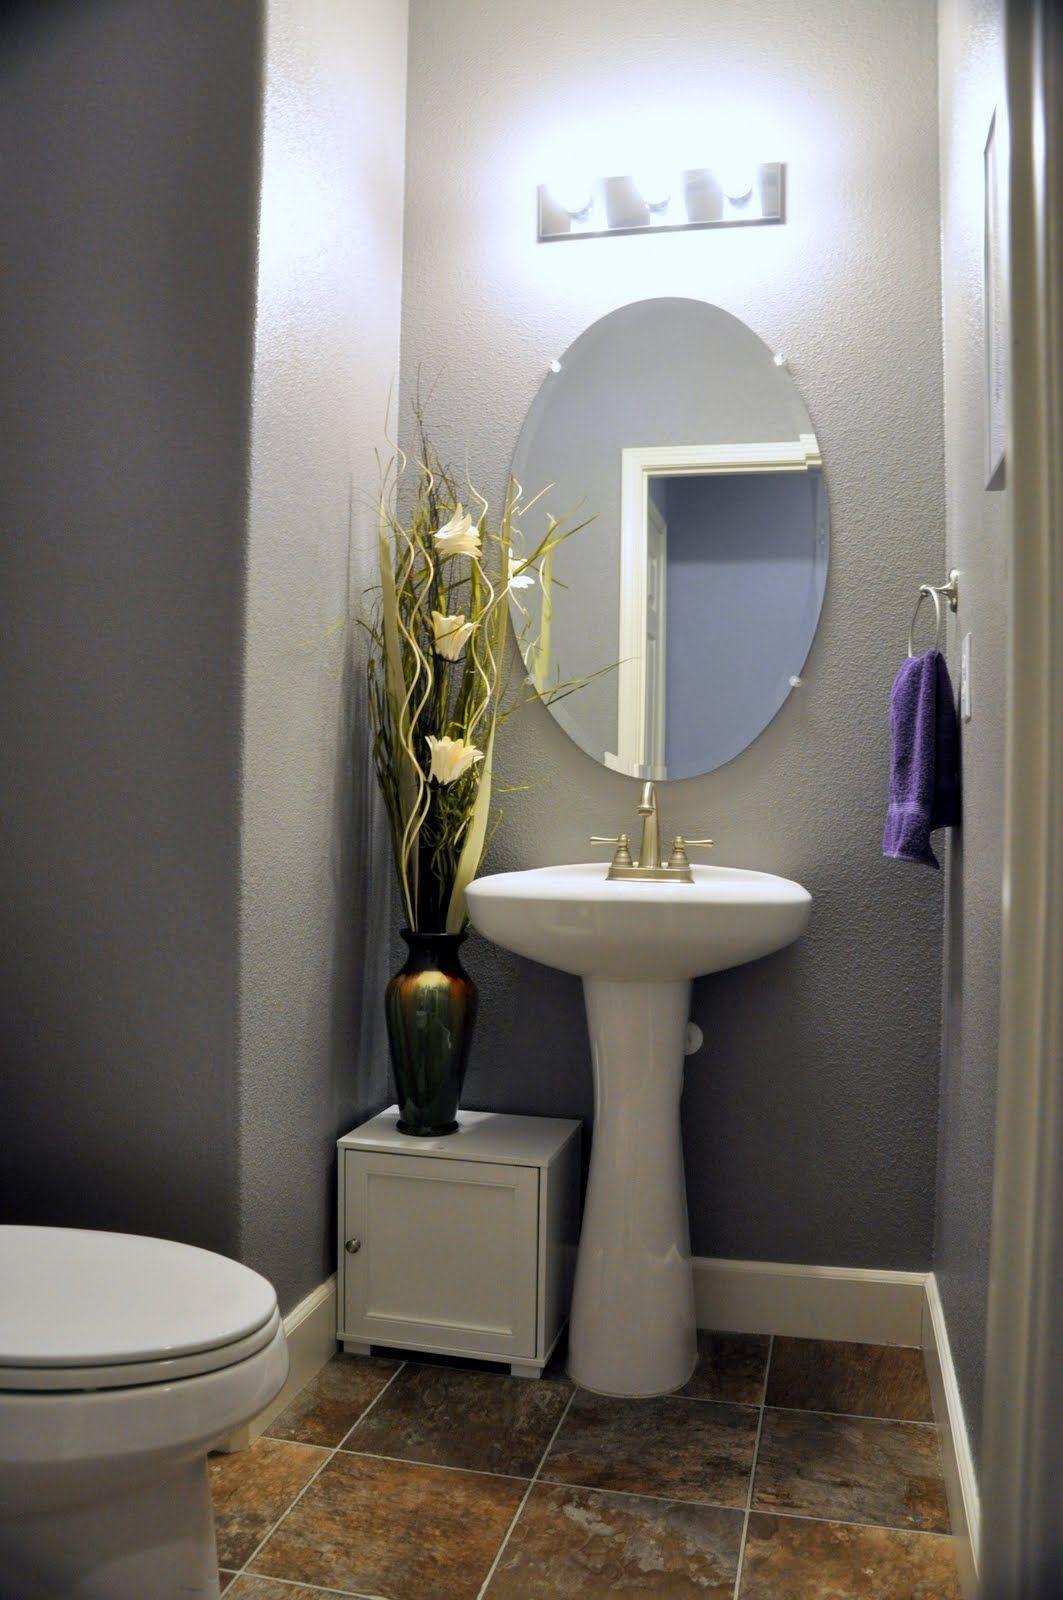 20 Beautiful Powder Room Ideas With Pedestal Sink In 2020 Powder Room Decor Powder Room Small Small Half Bathrooms